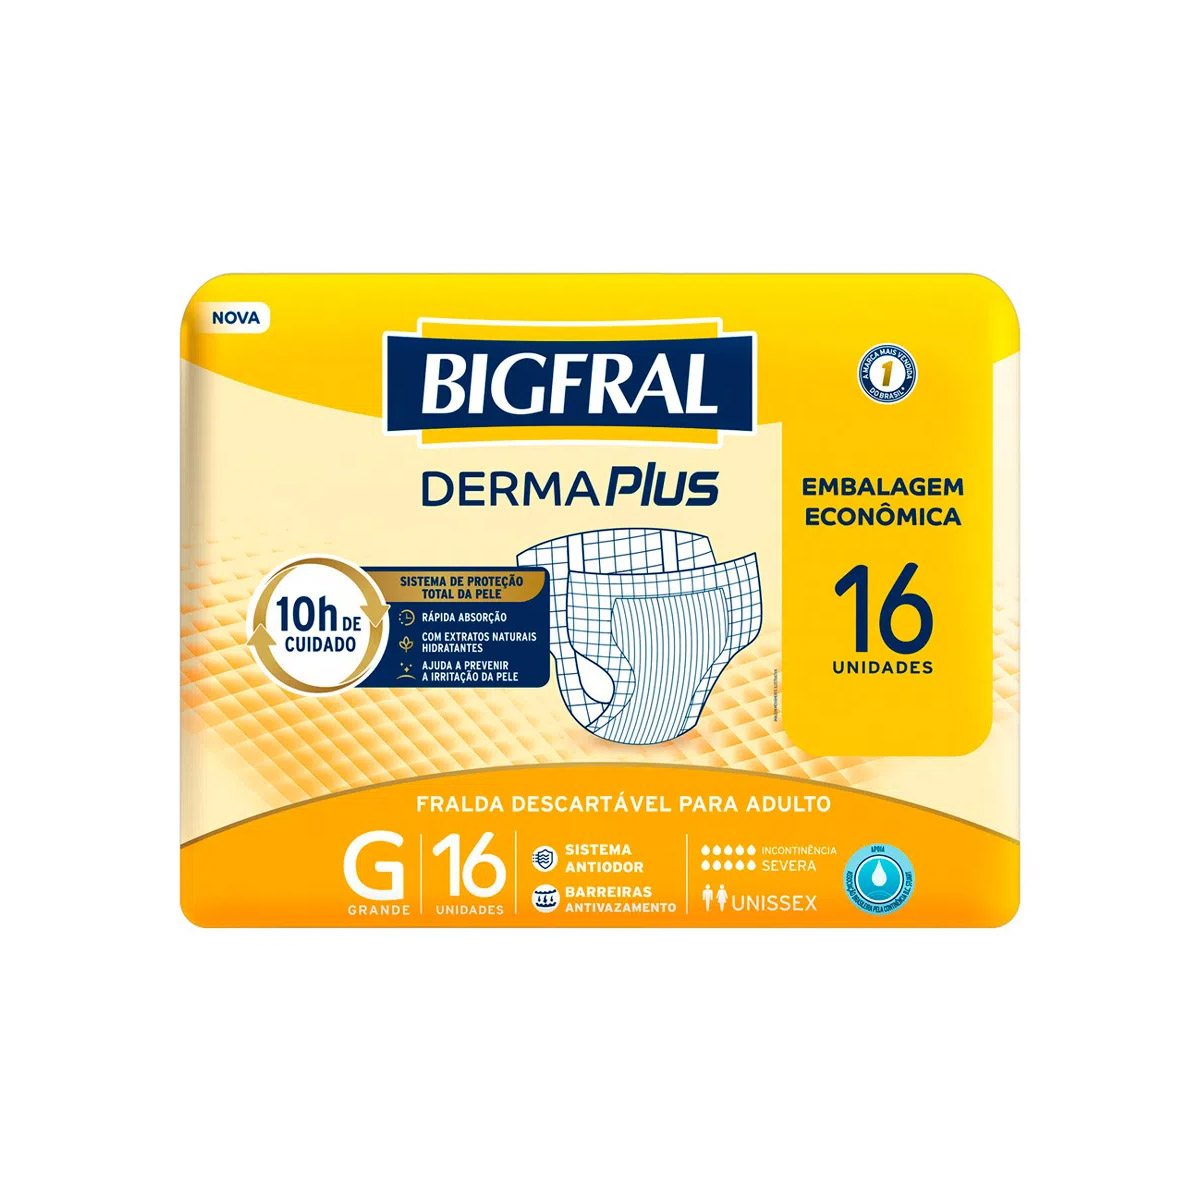 FRALDA GERIÁTRICA BIGFRAL DERMA PLUS ECONÔMICA G (C/16) - BIGFRAL